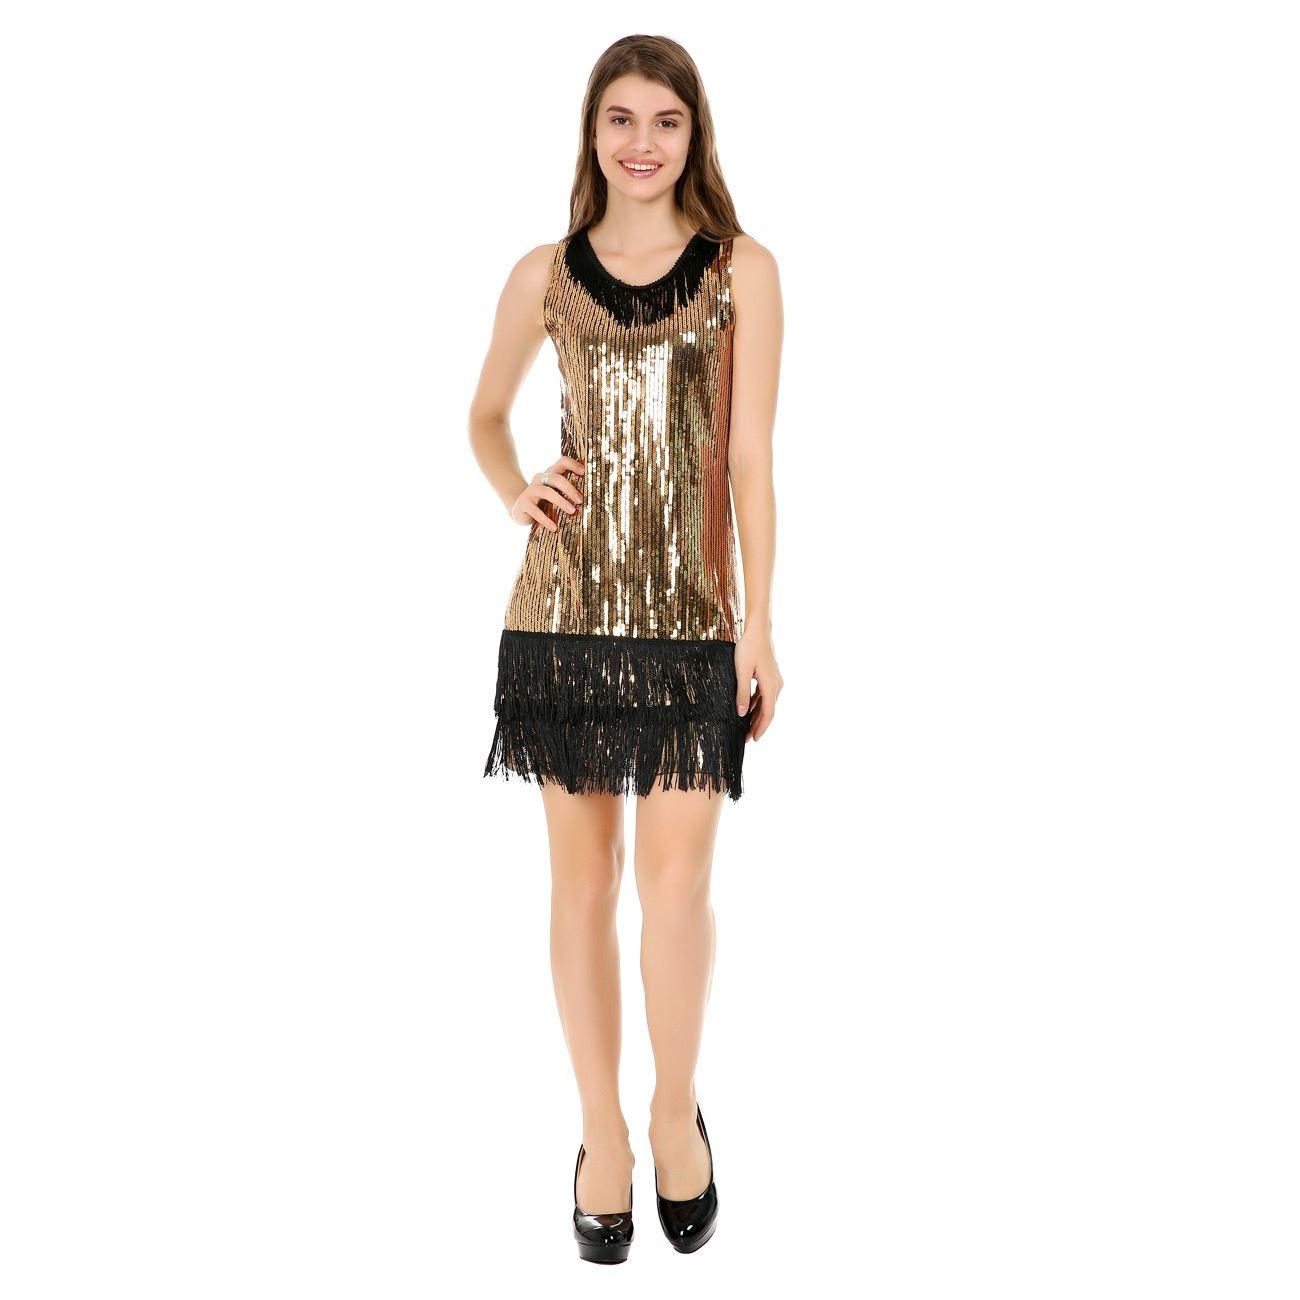 1f1900d51a5 Αποκριάτικο Φόρεμα Charleston Χρυσό - One Size